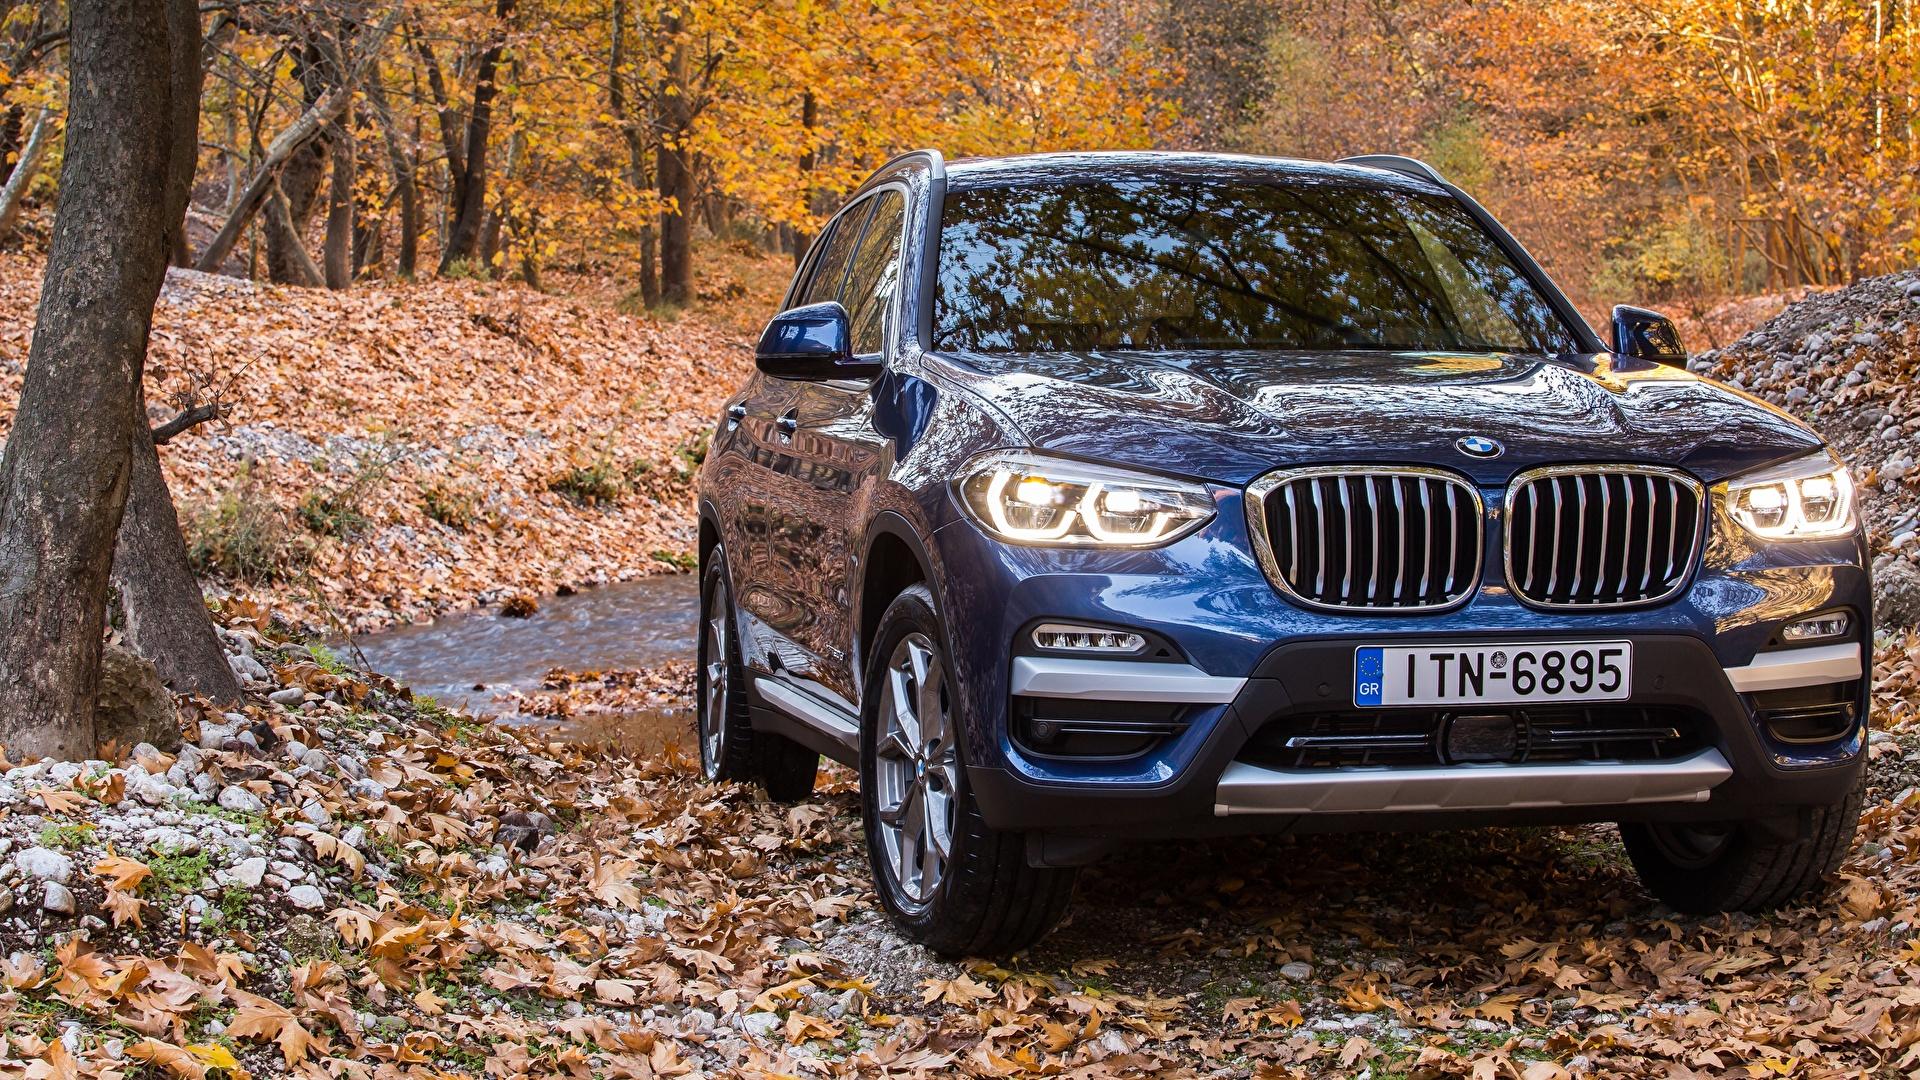 Фотографии BMW 2017 xLine X3 xDrive20d Синий Спереди Автомобили 1920x1080 БМВ синяя синие синих авто машины машина автомобиль